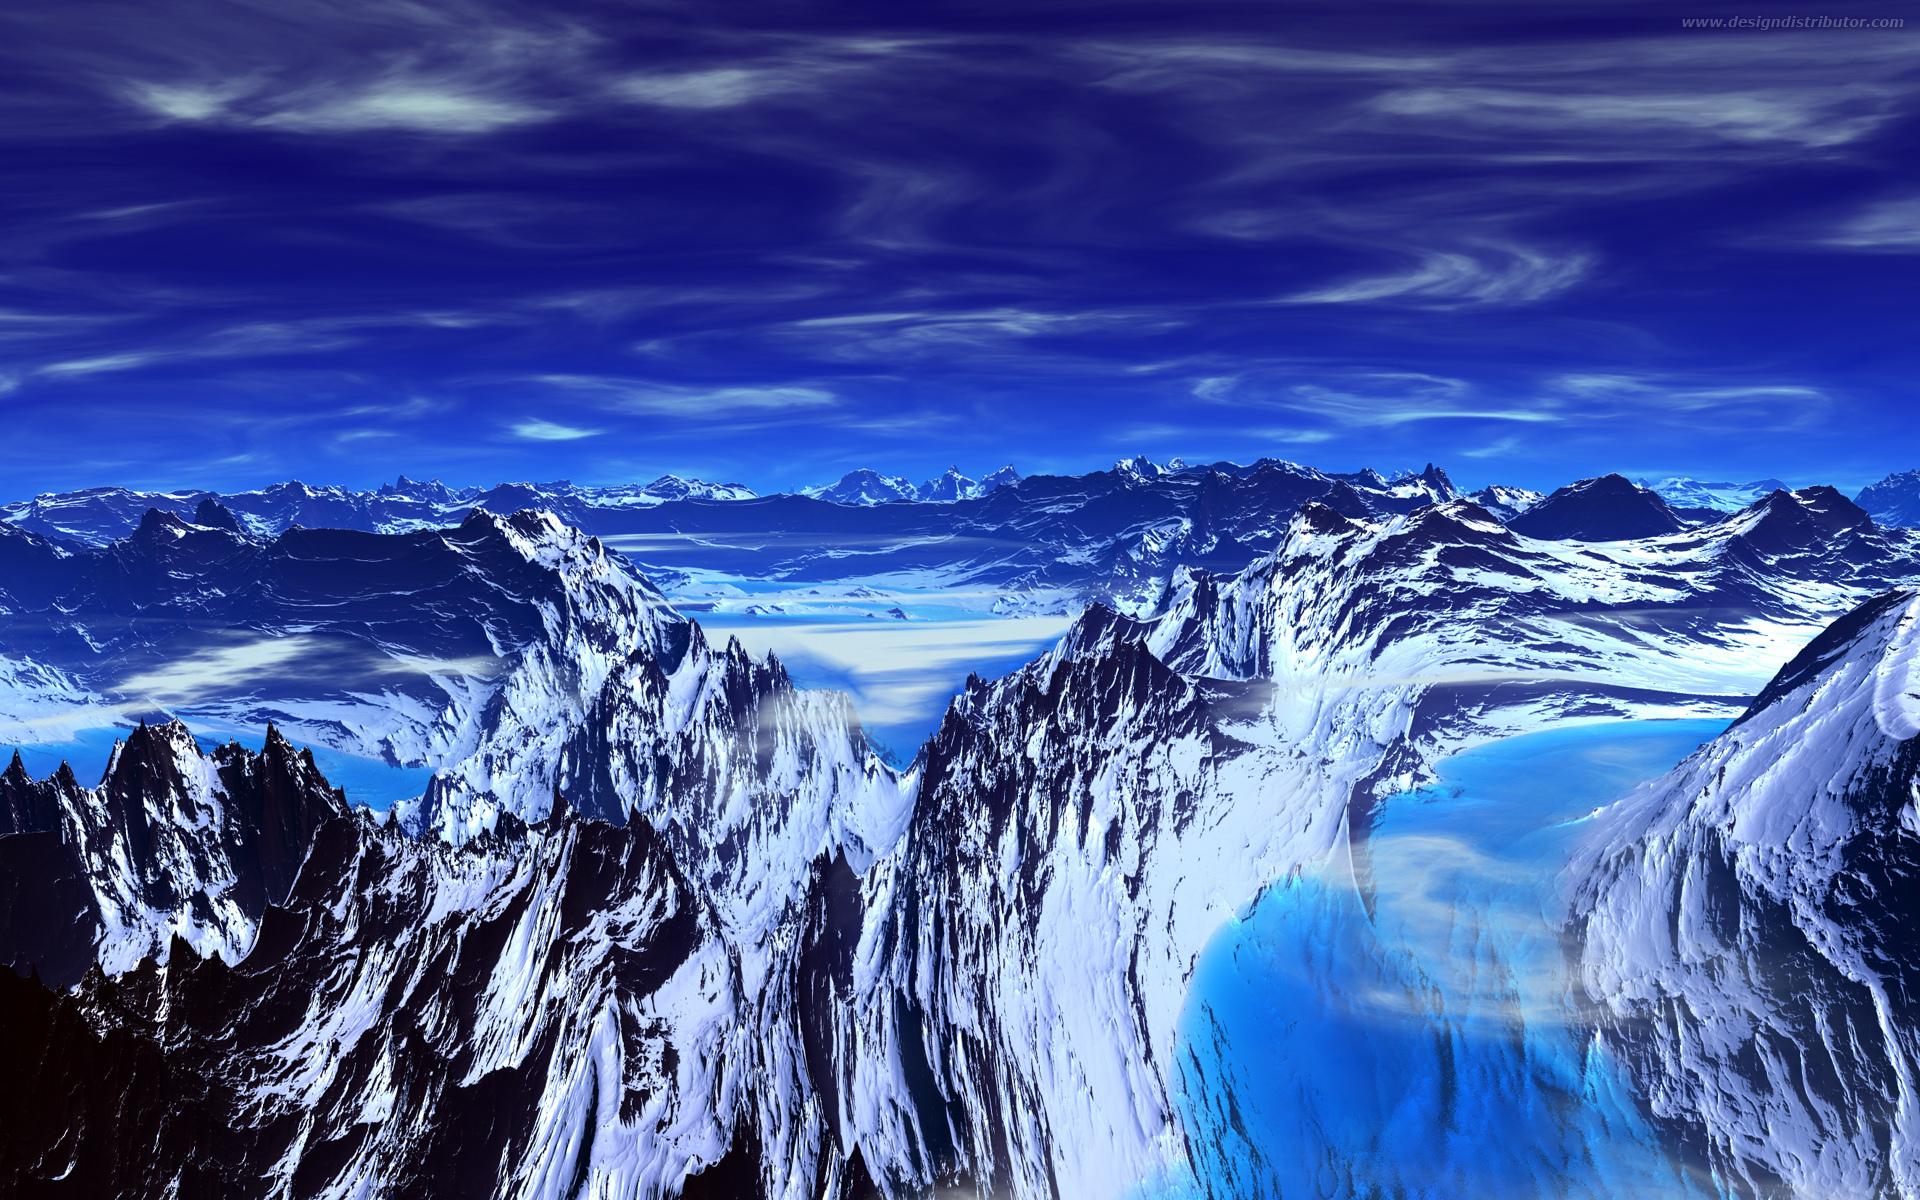 Nature Full HD Wallpaper   National Geographic Wallpaper 7822846 1920x1200